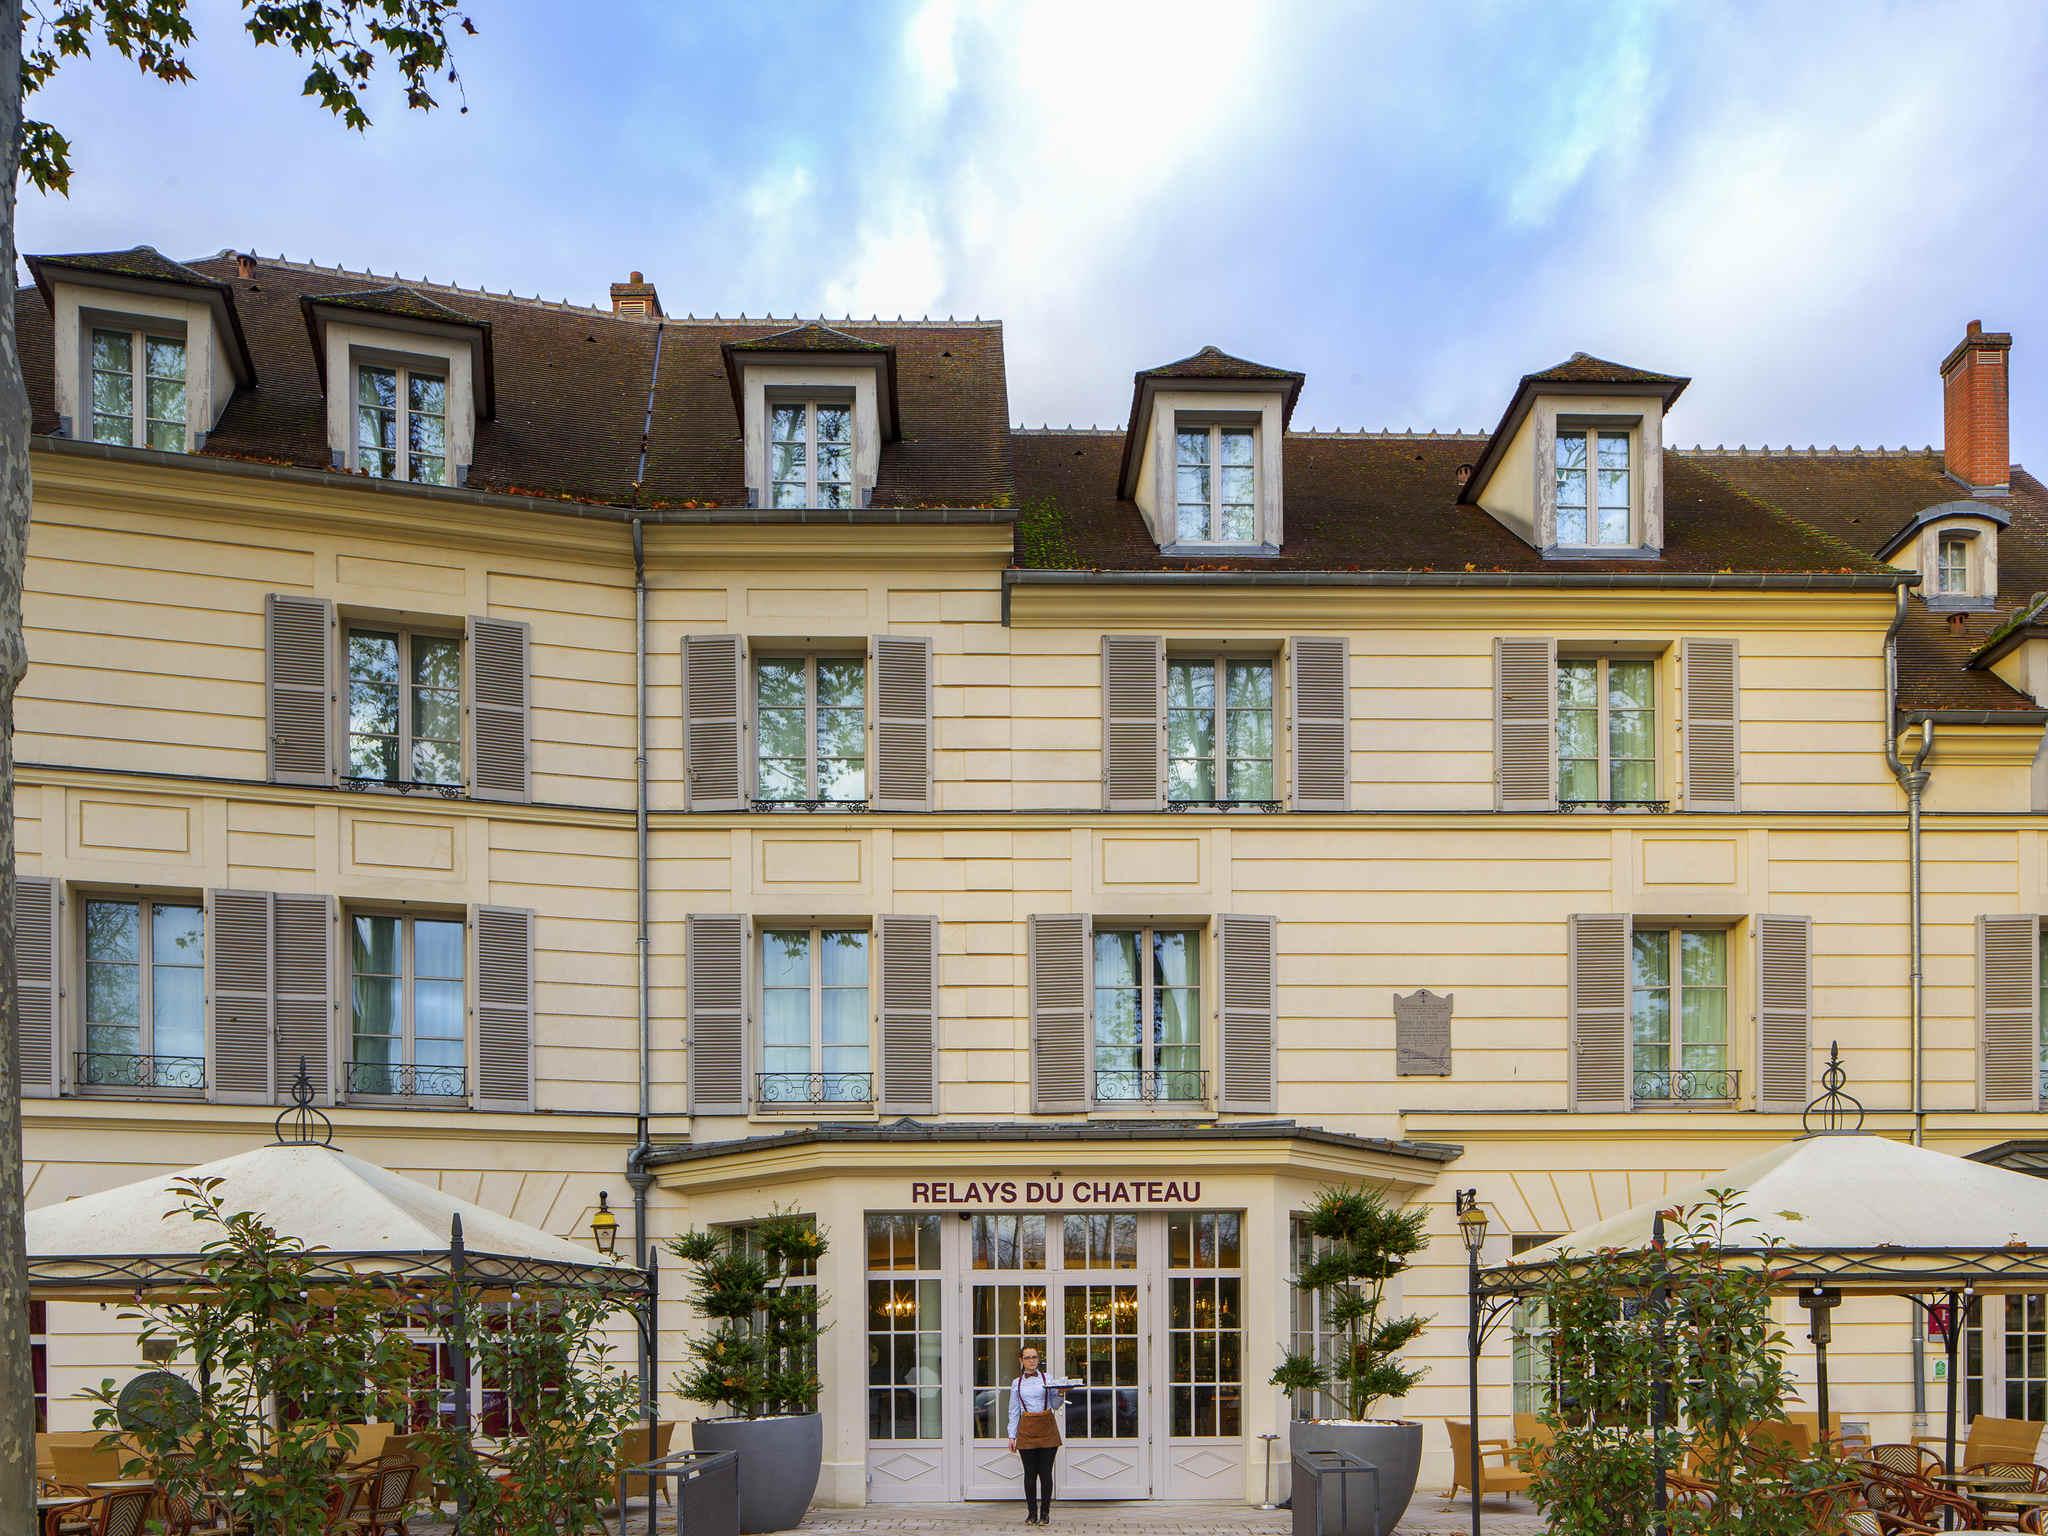 Hotel – Hotel Mercure Rambouillet Relays du Château